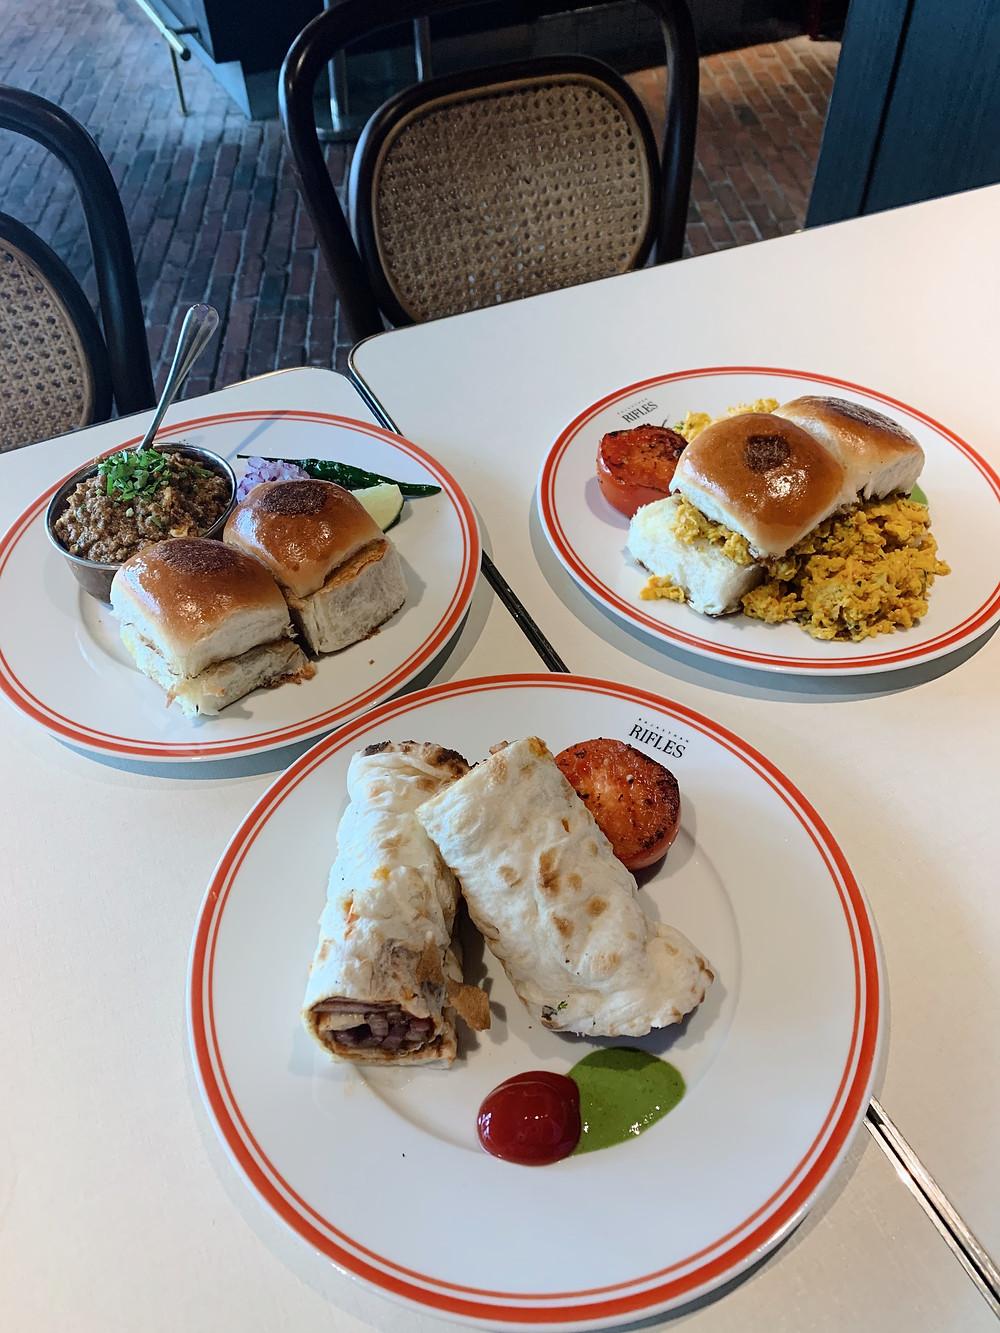 Breakfast dishes at Rajasthan Rifles restaurant in Hong Kong